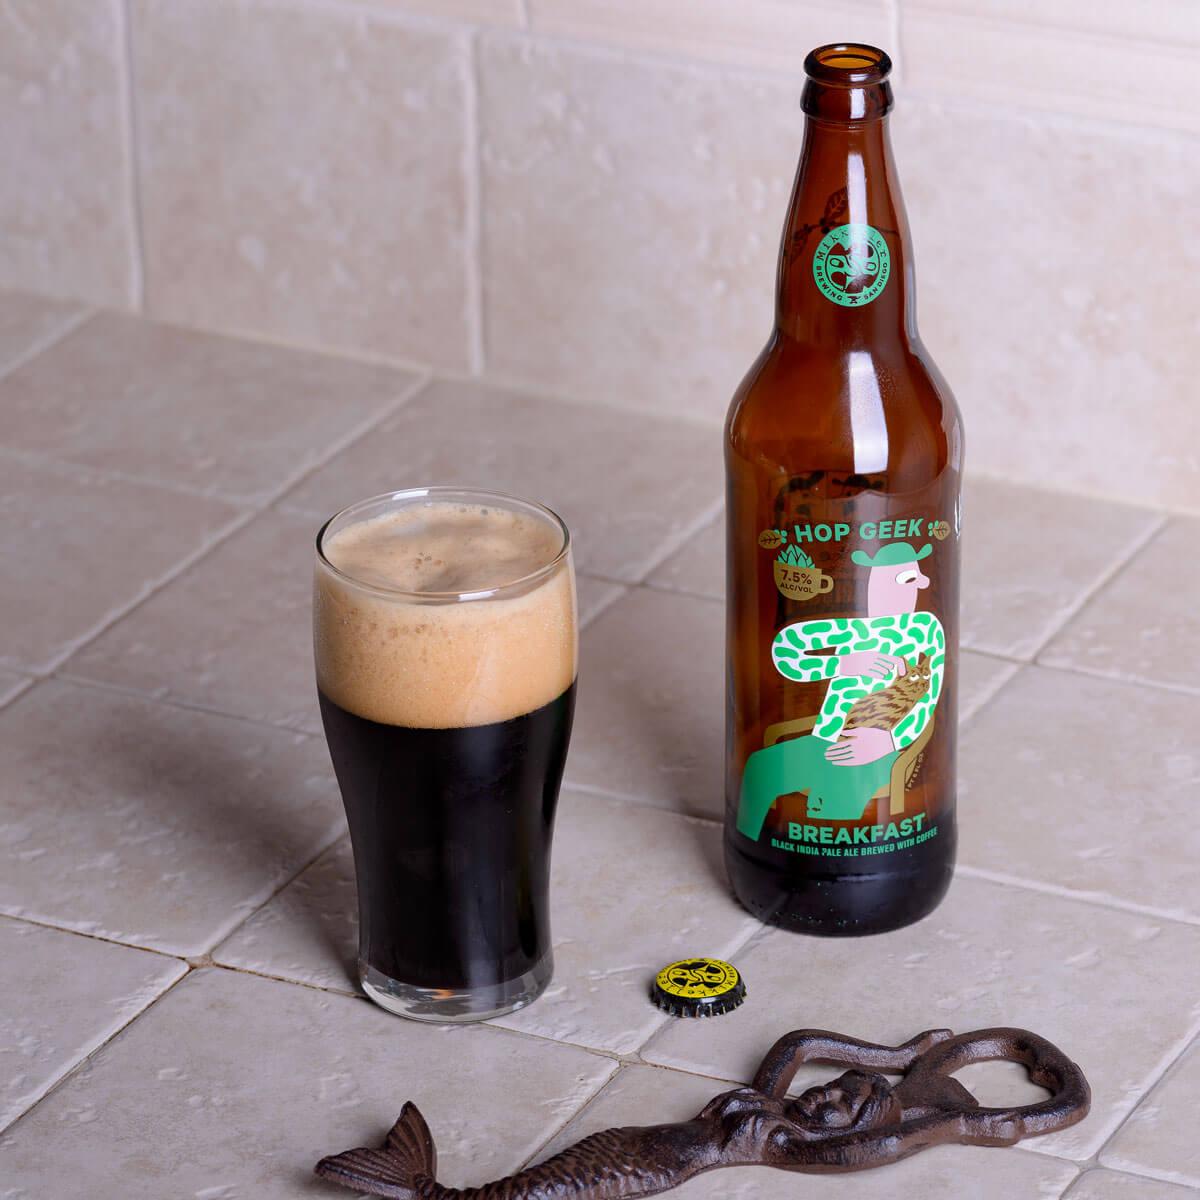 Hop Geek Breakfast, an American-style Black Ale by Mikkeller ApS